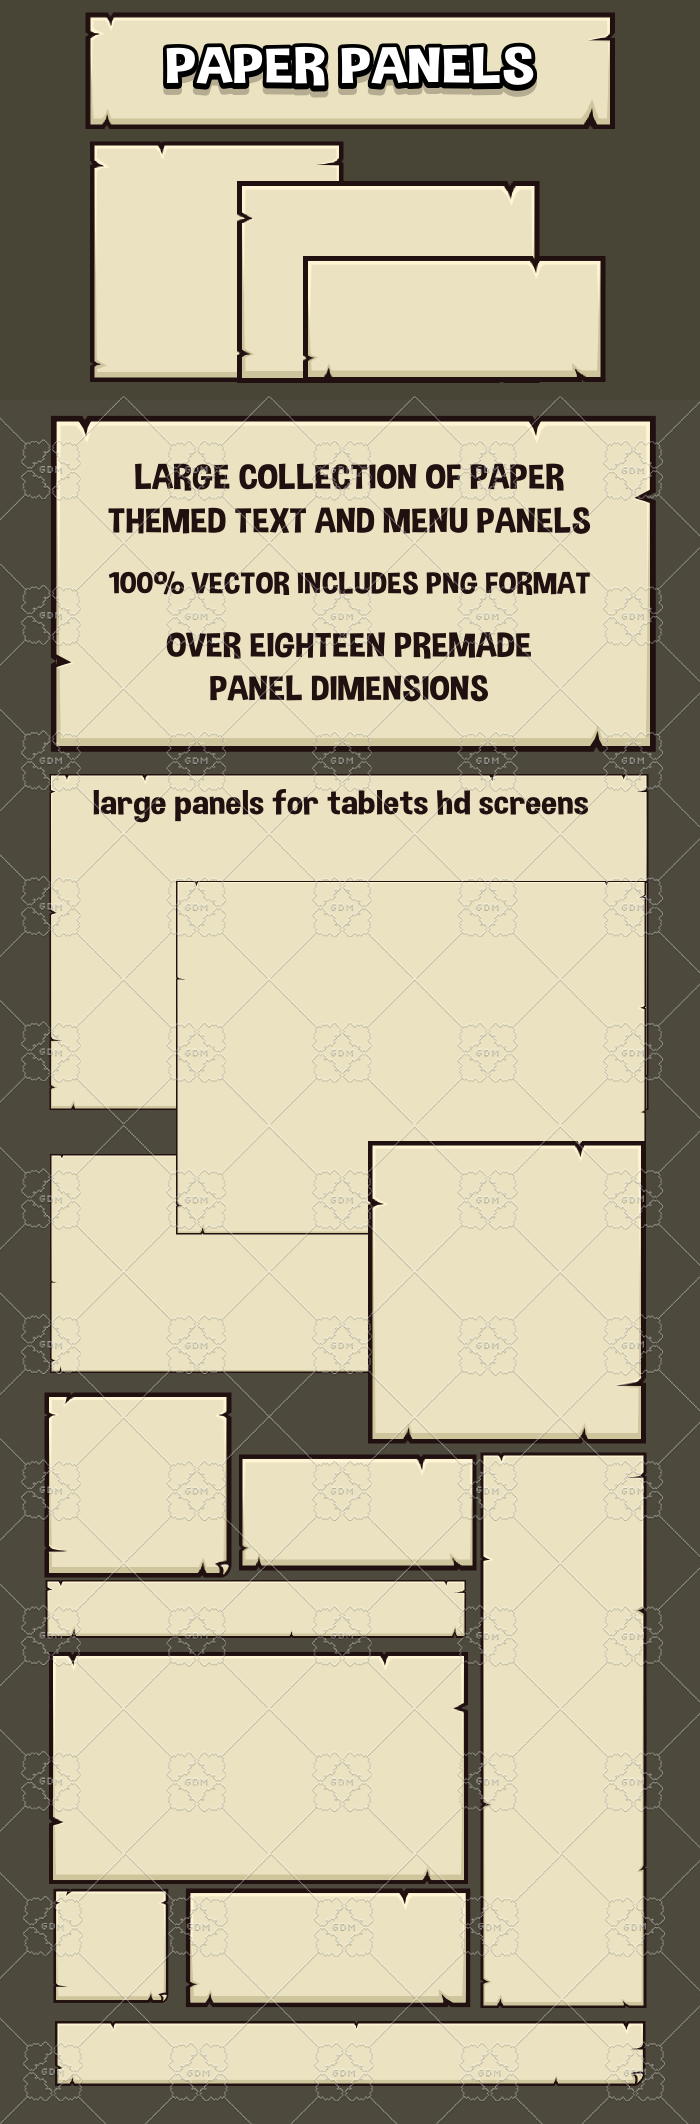 Paper panels